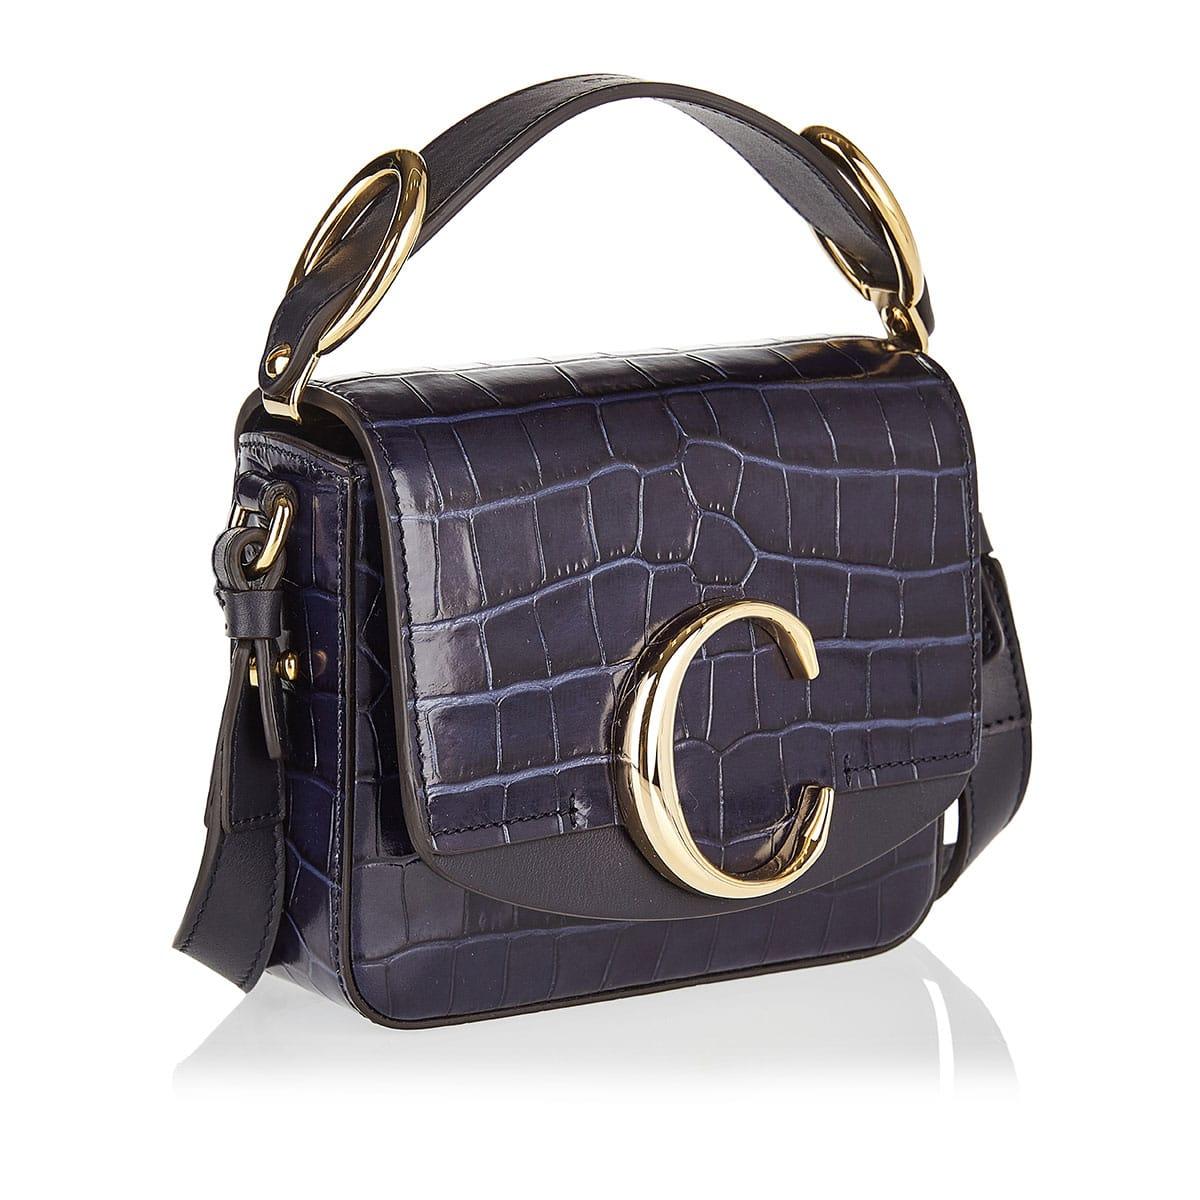 Mini Chloé C croc-effect leather bag